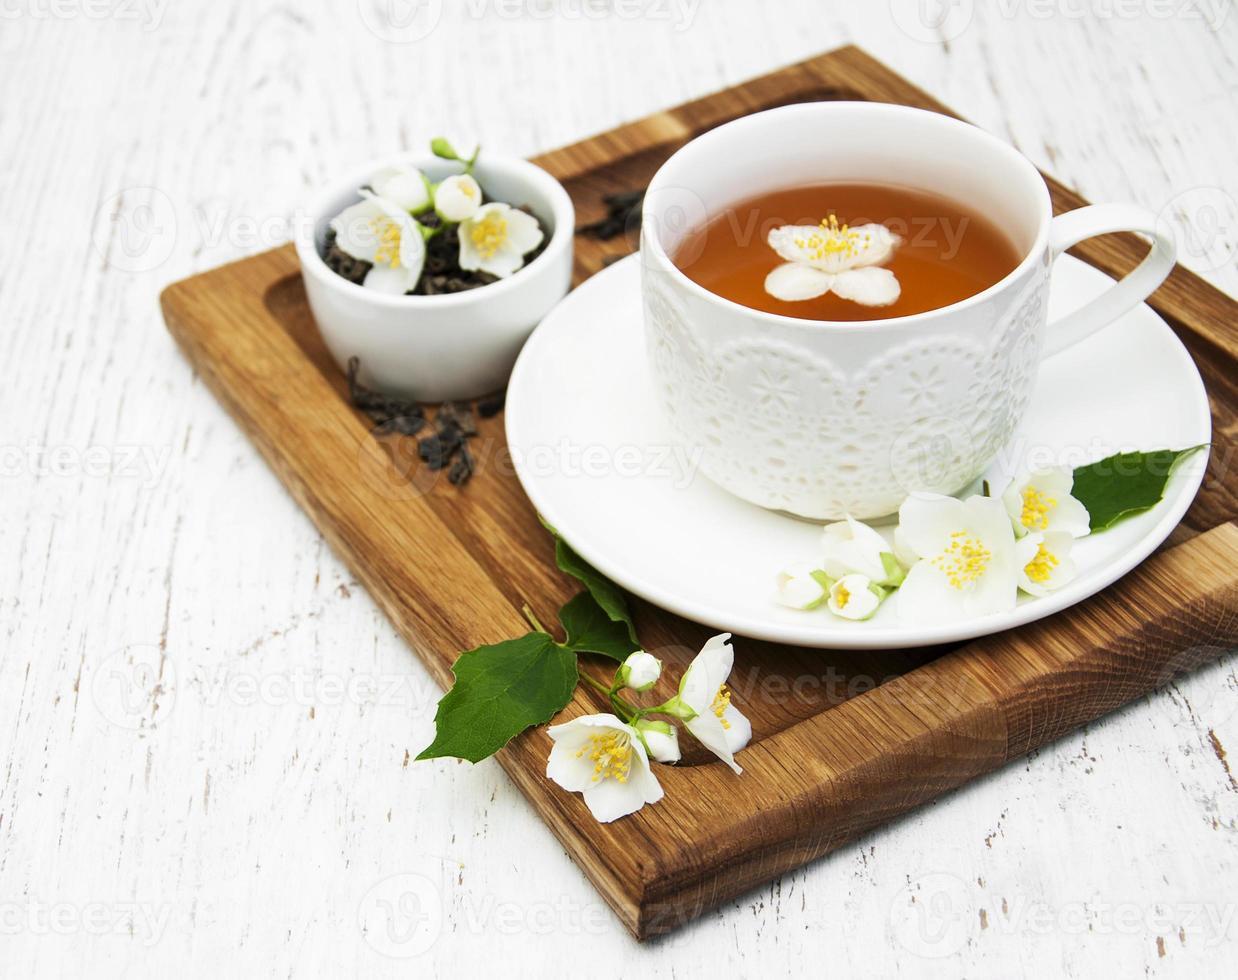 kopp te med jasminblommor foto